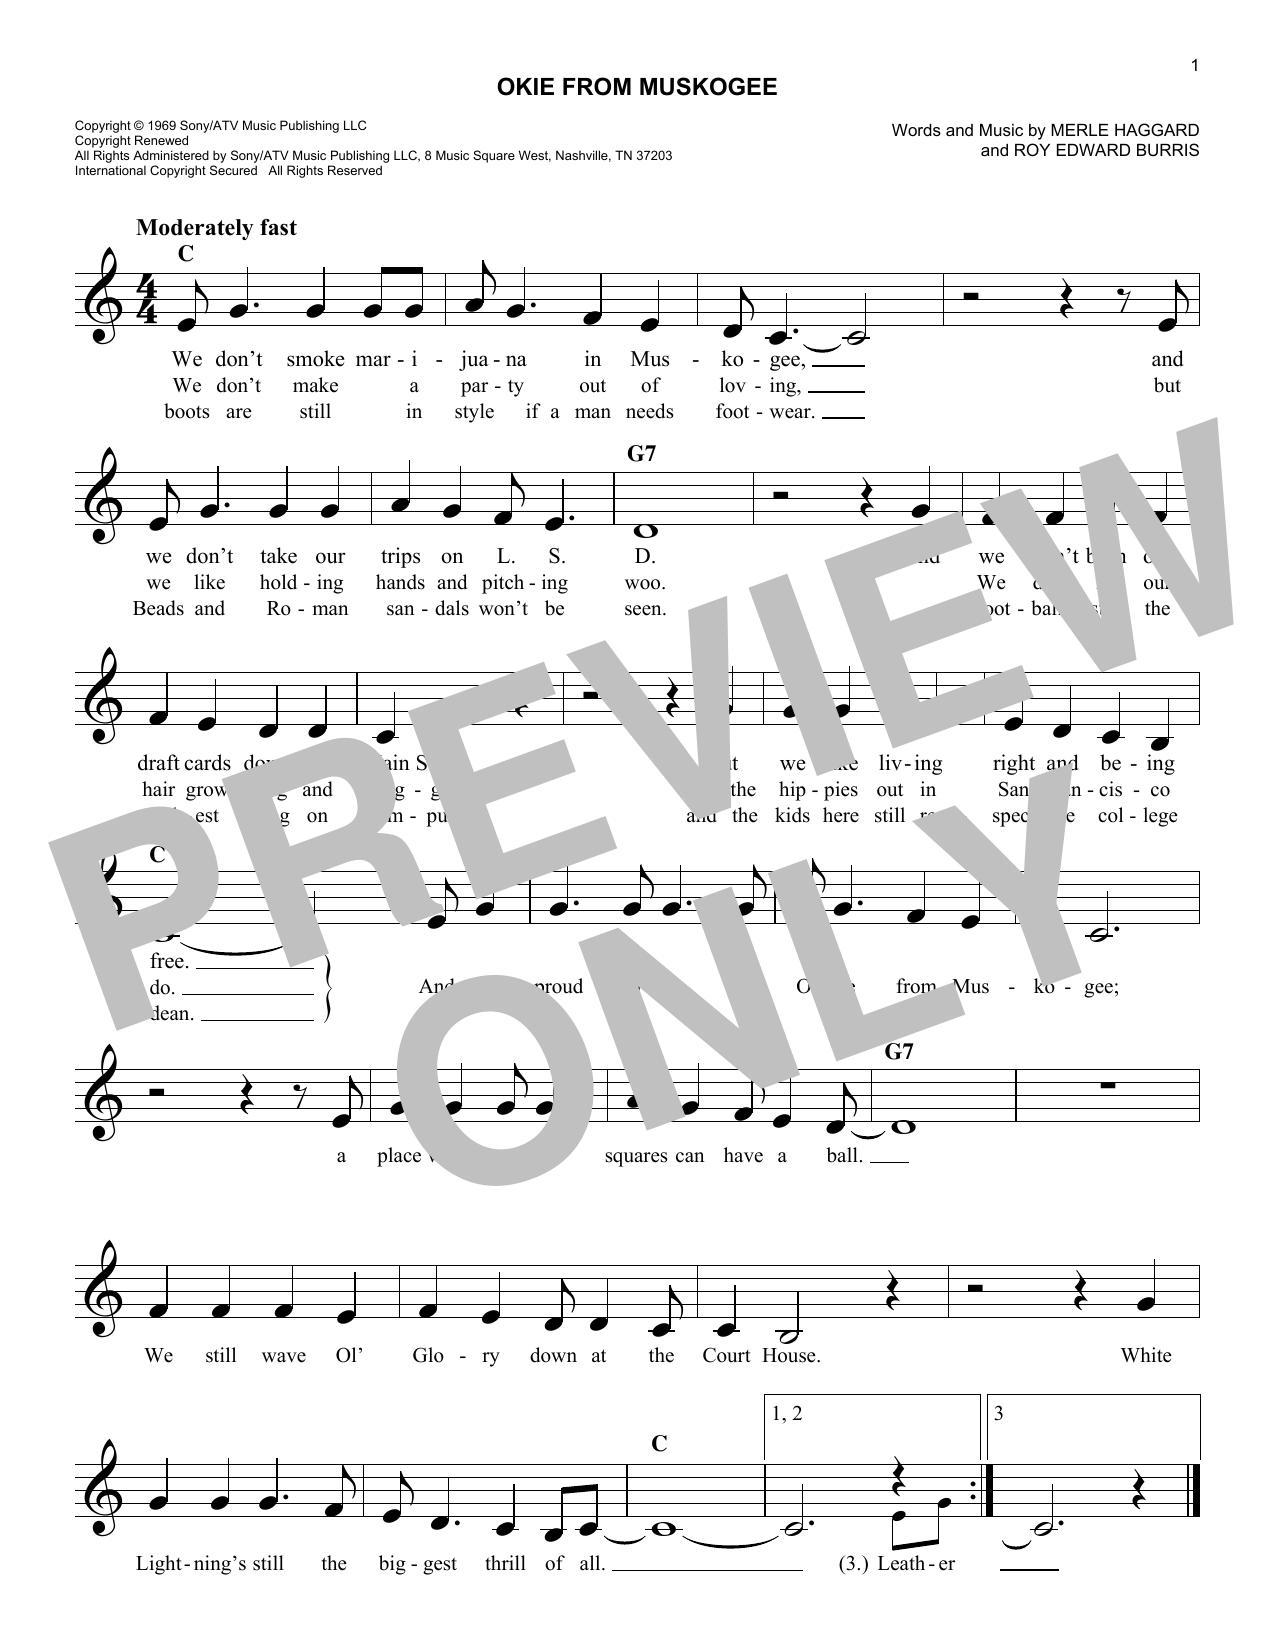 Okie From Muskogee Sheet Music